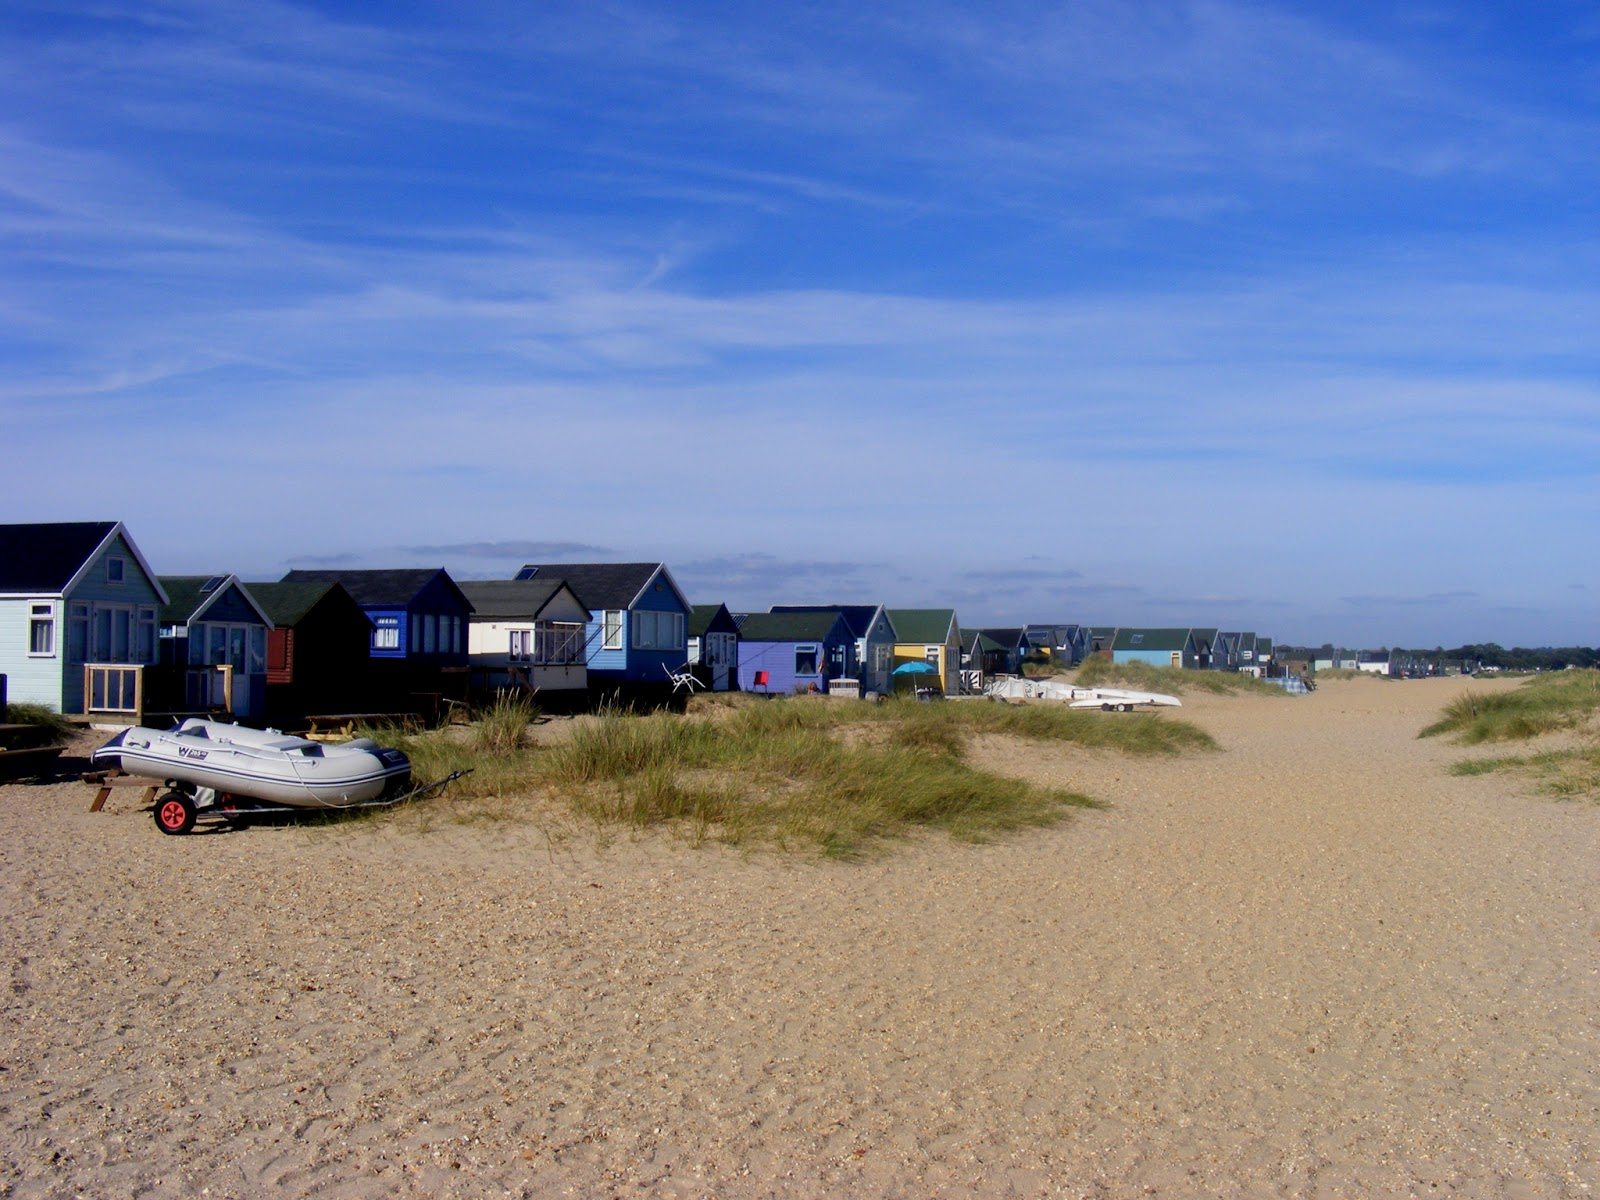 beach huts, domki plażowe